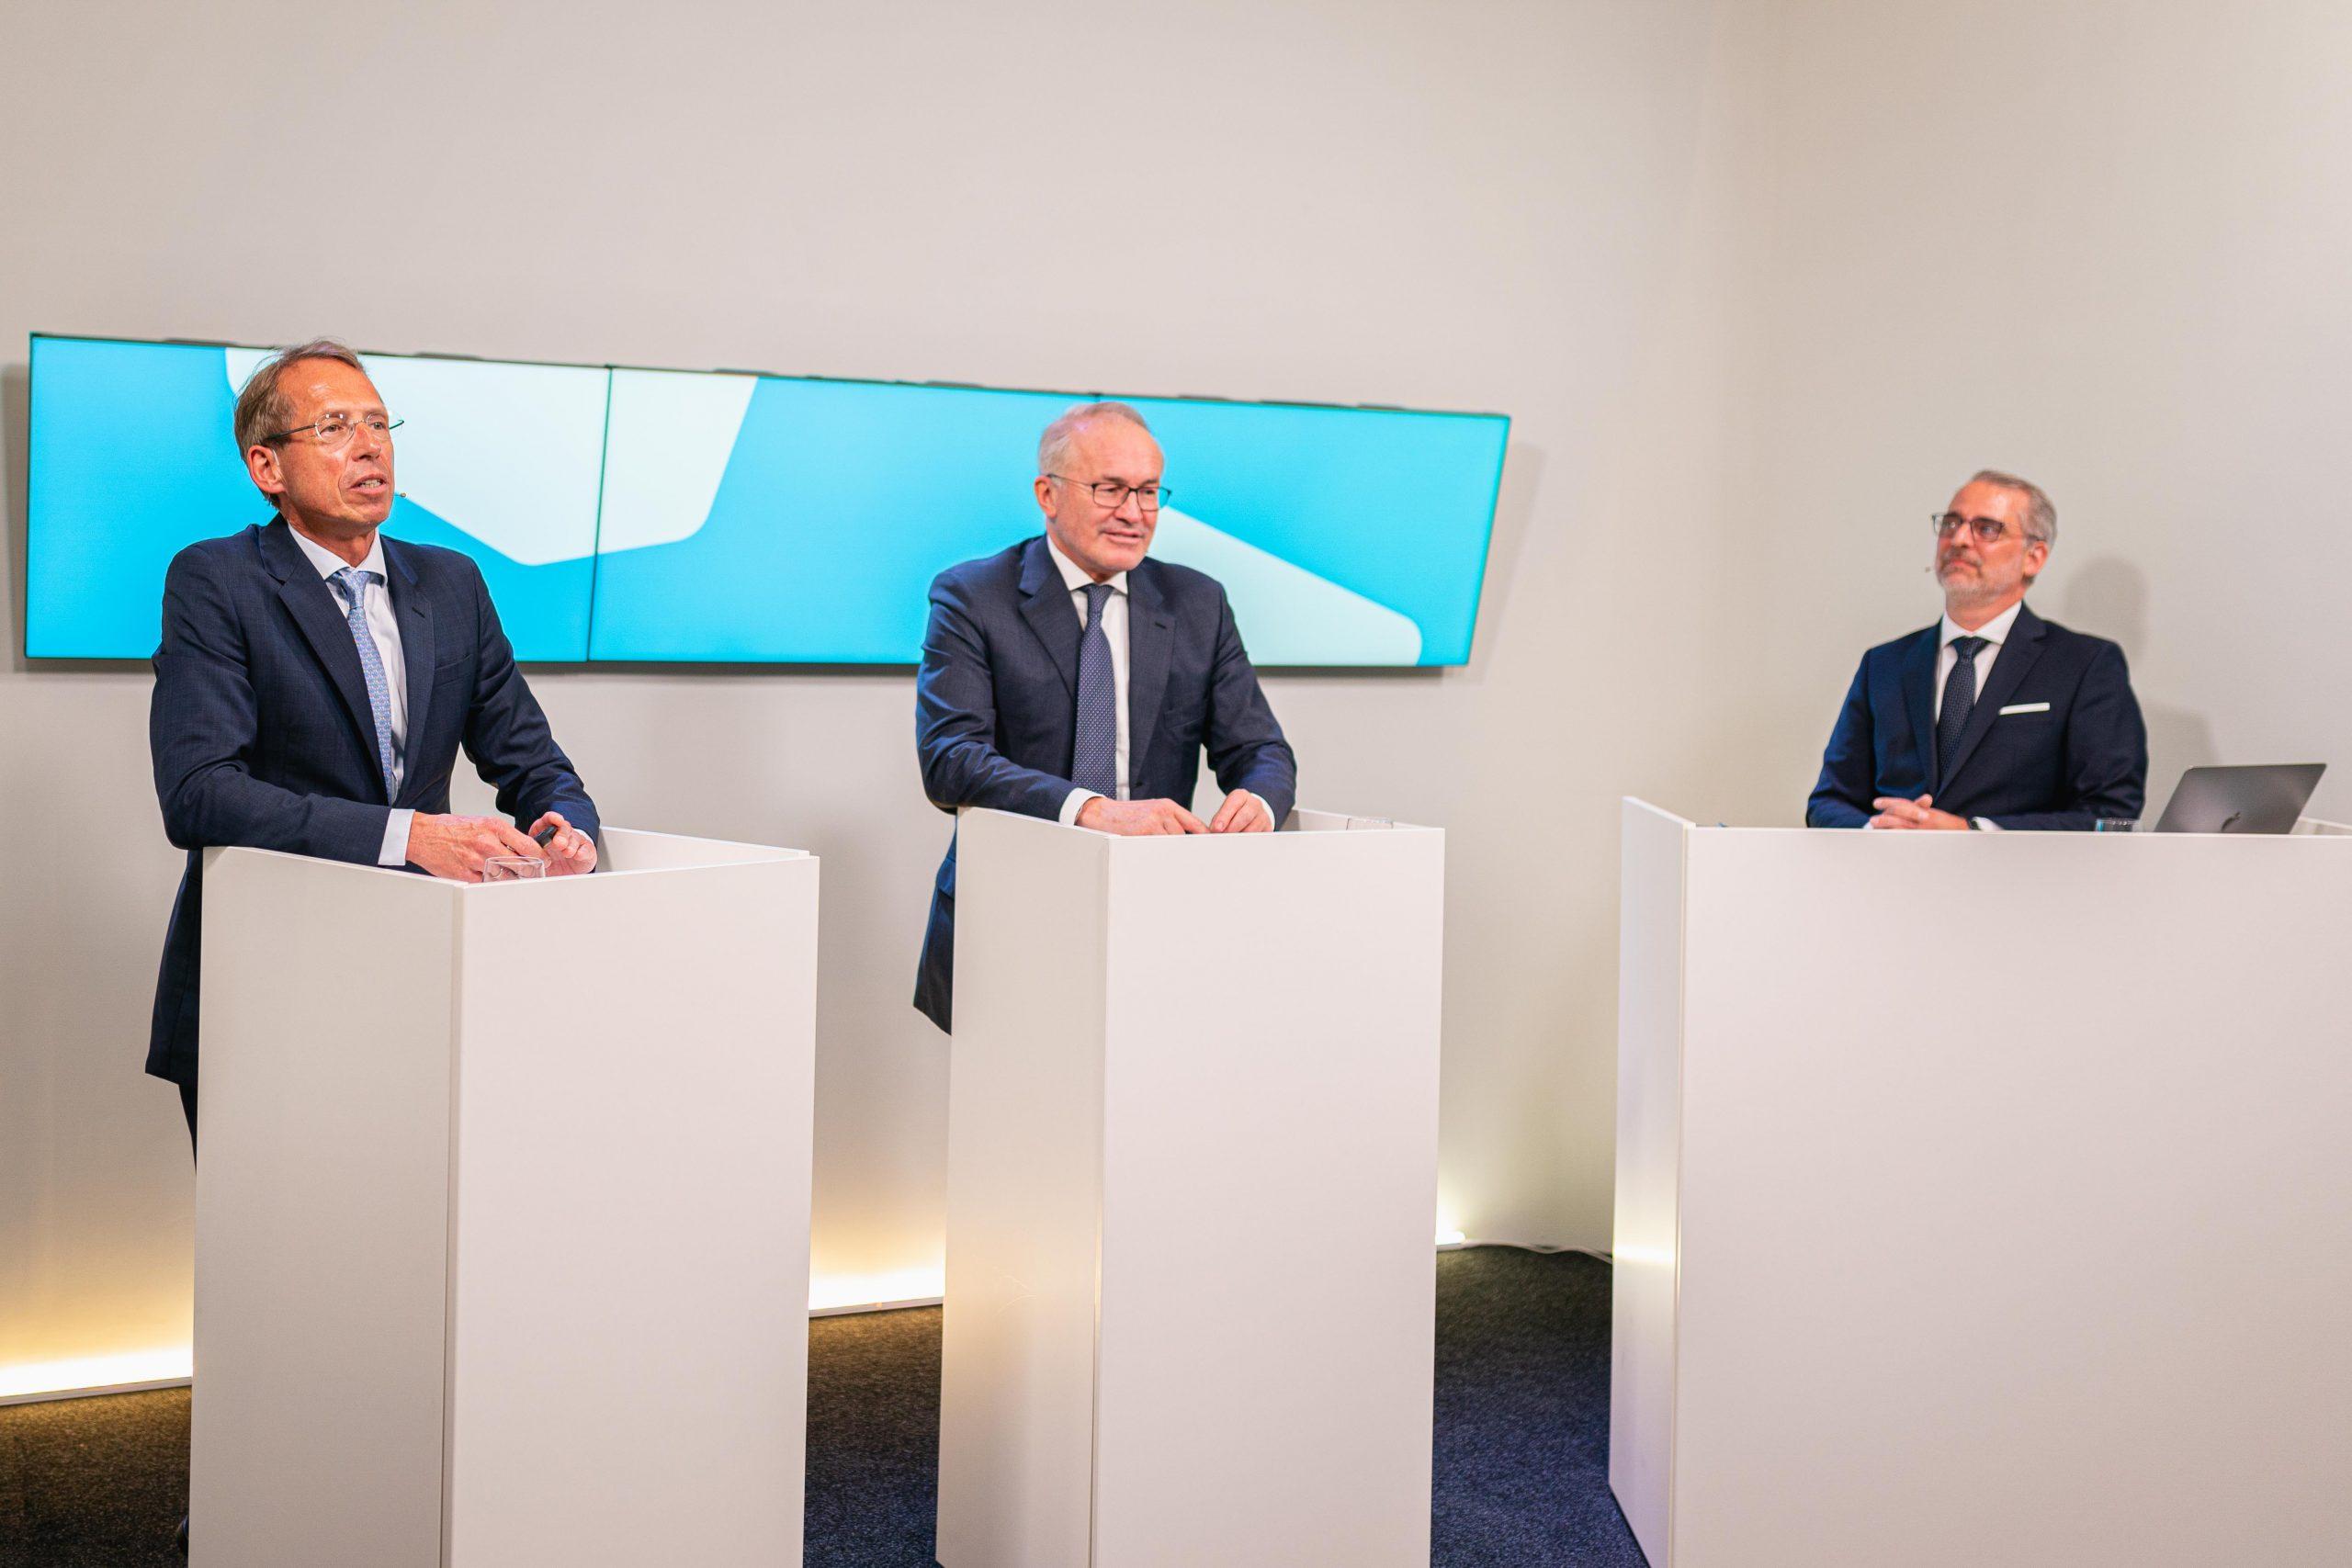 Prof Dr. Georg Schima, Dr. Roland Gerlach, Mag. Thomas Wondrak